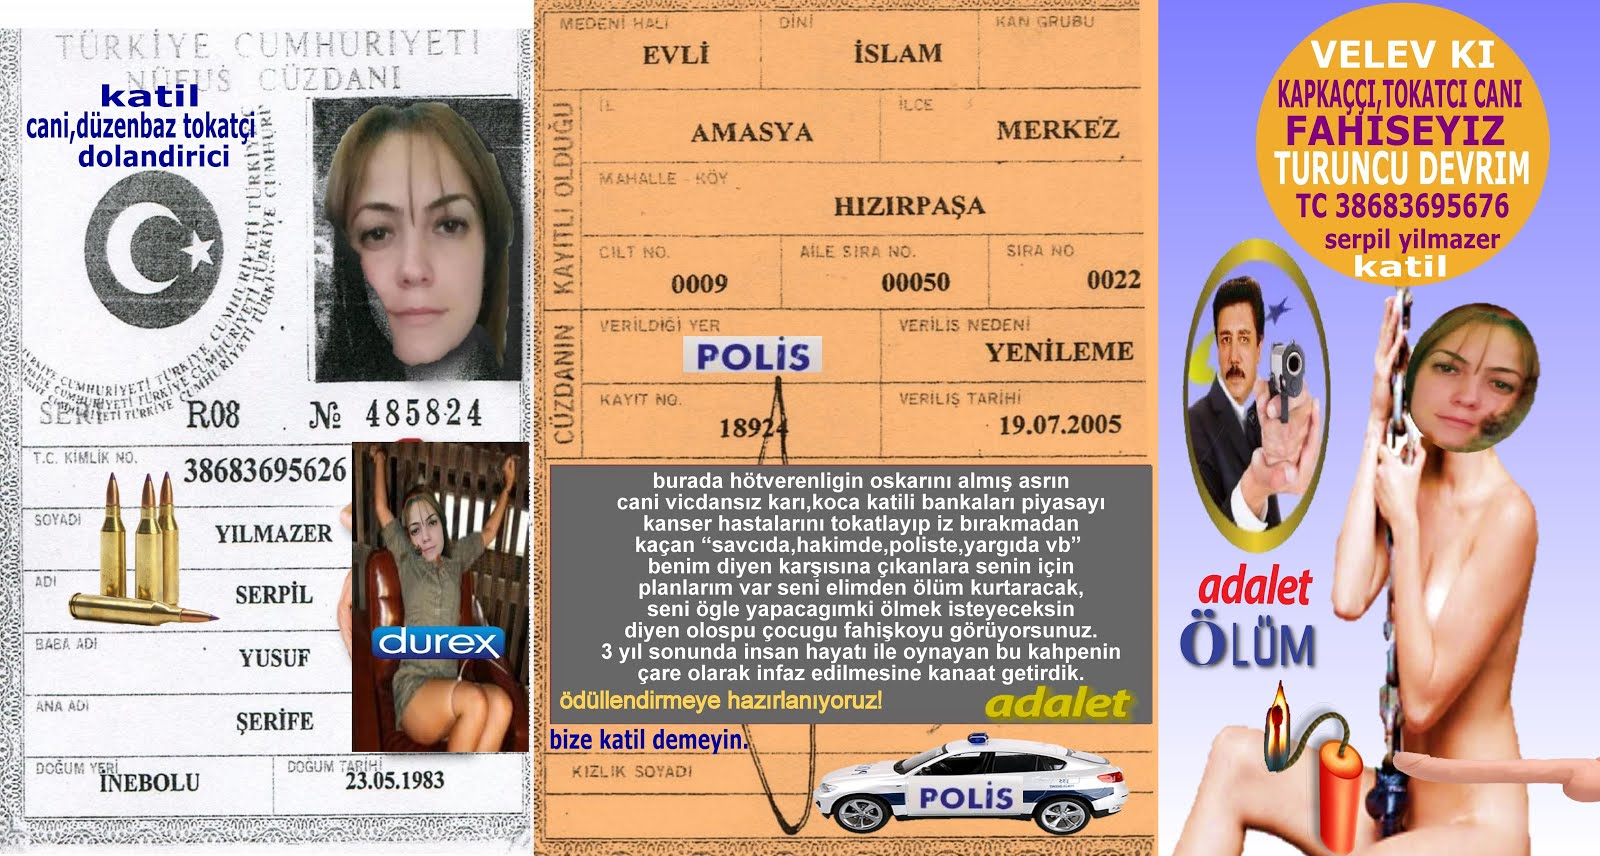 #polis